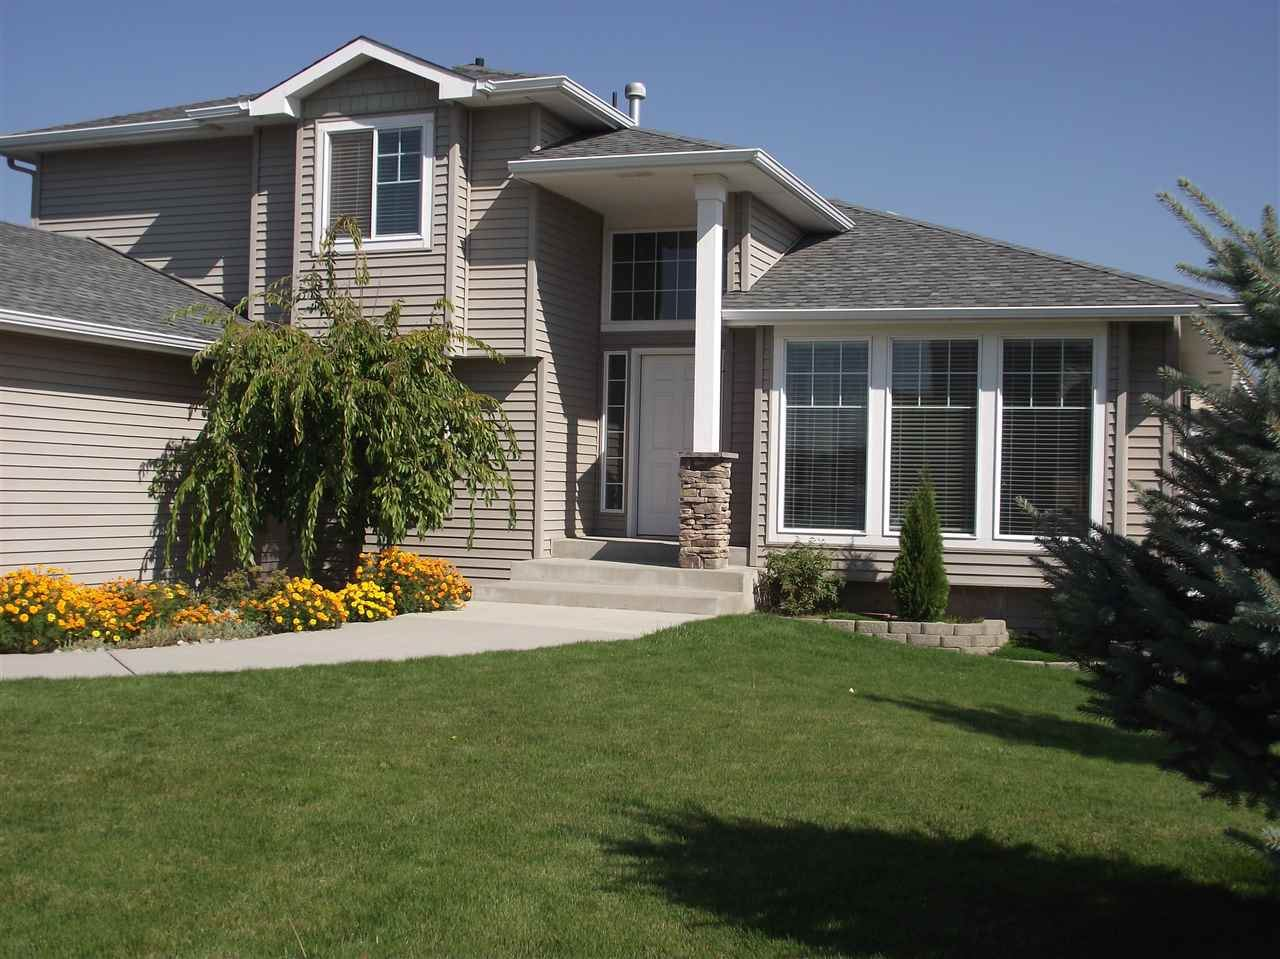 6515 S Sandstone St, Spokane, WA 99224 - #: 202022261